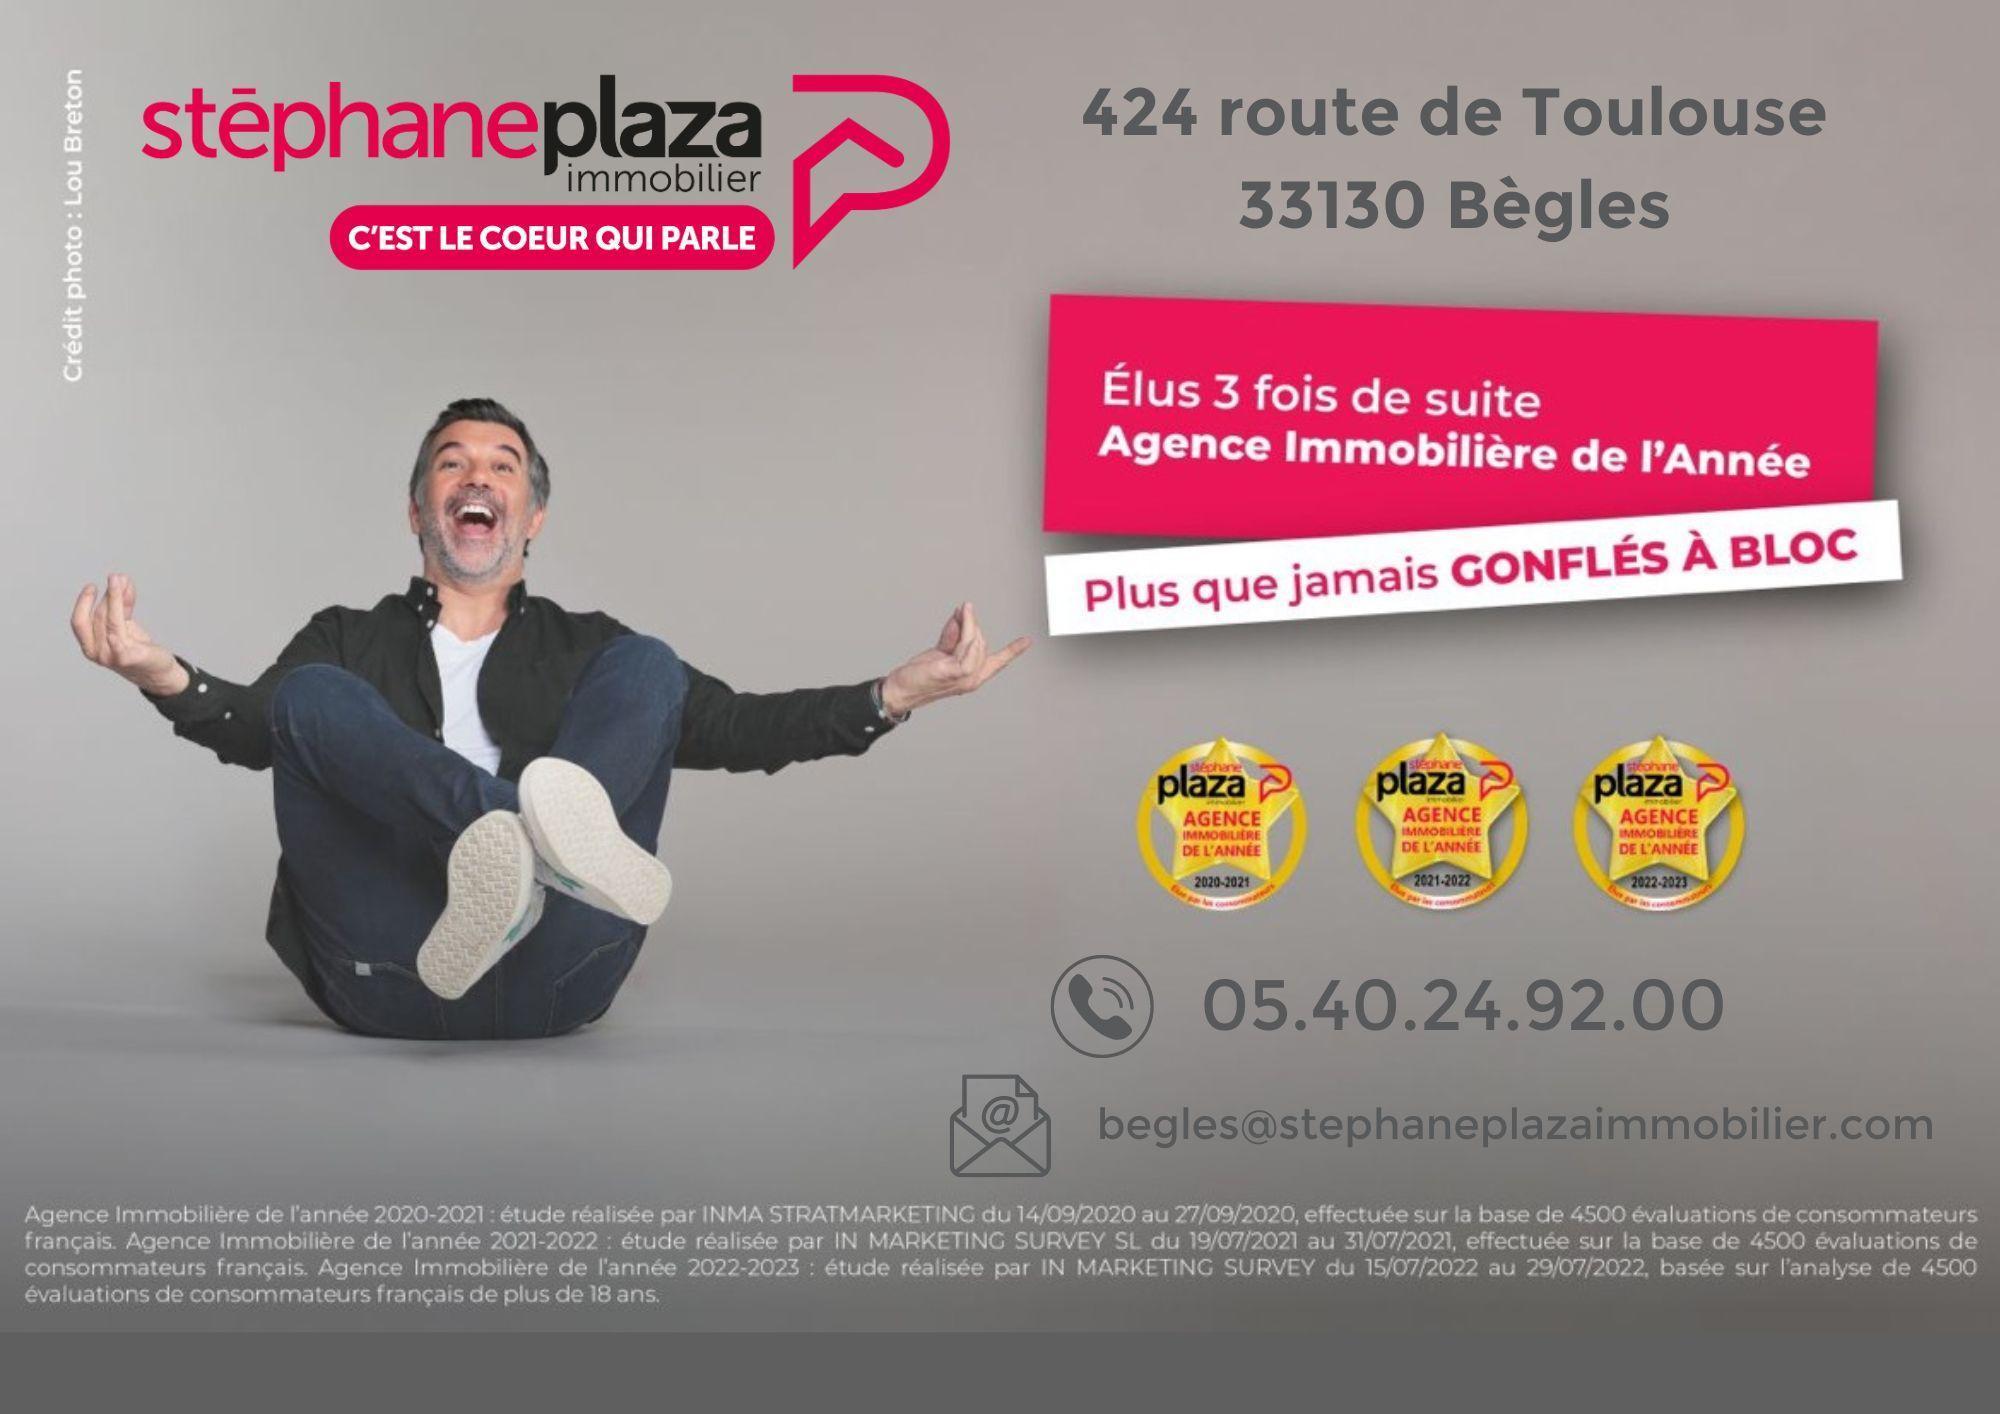 Stéphane Plaza Immobilier Bègles agence immobilière Bègles 33130